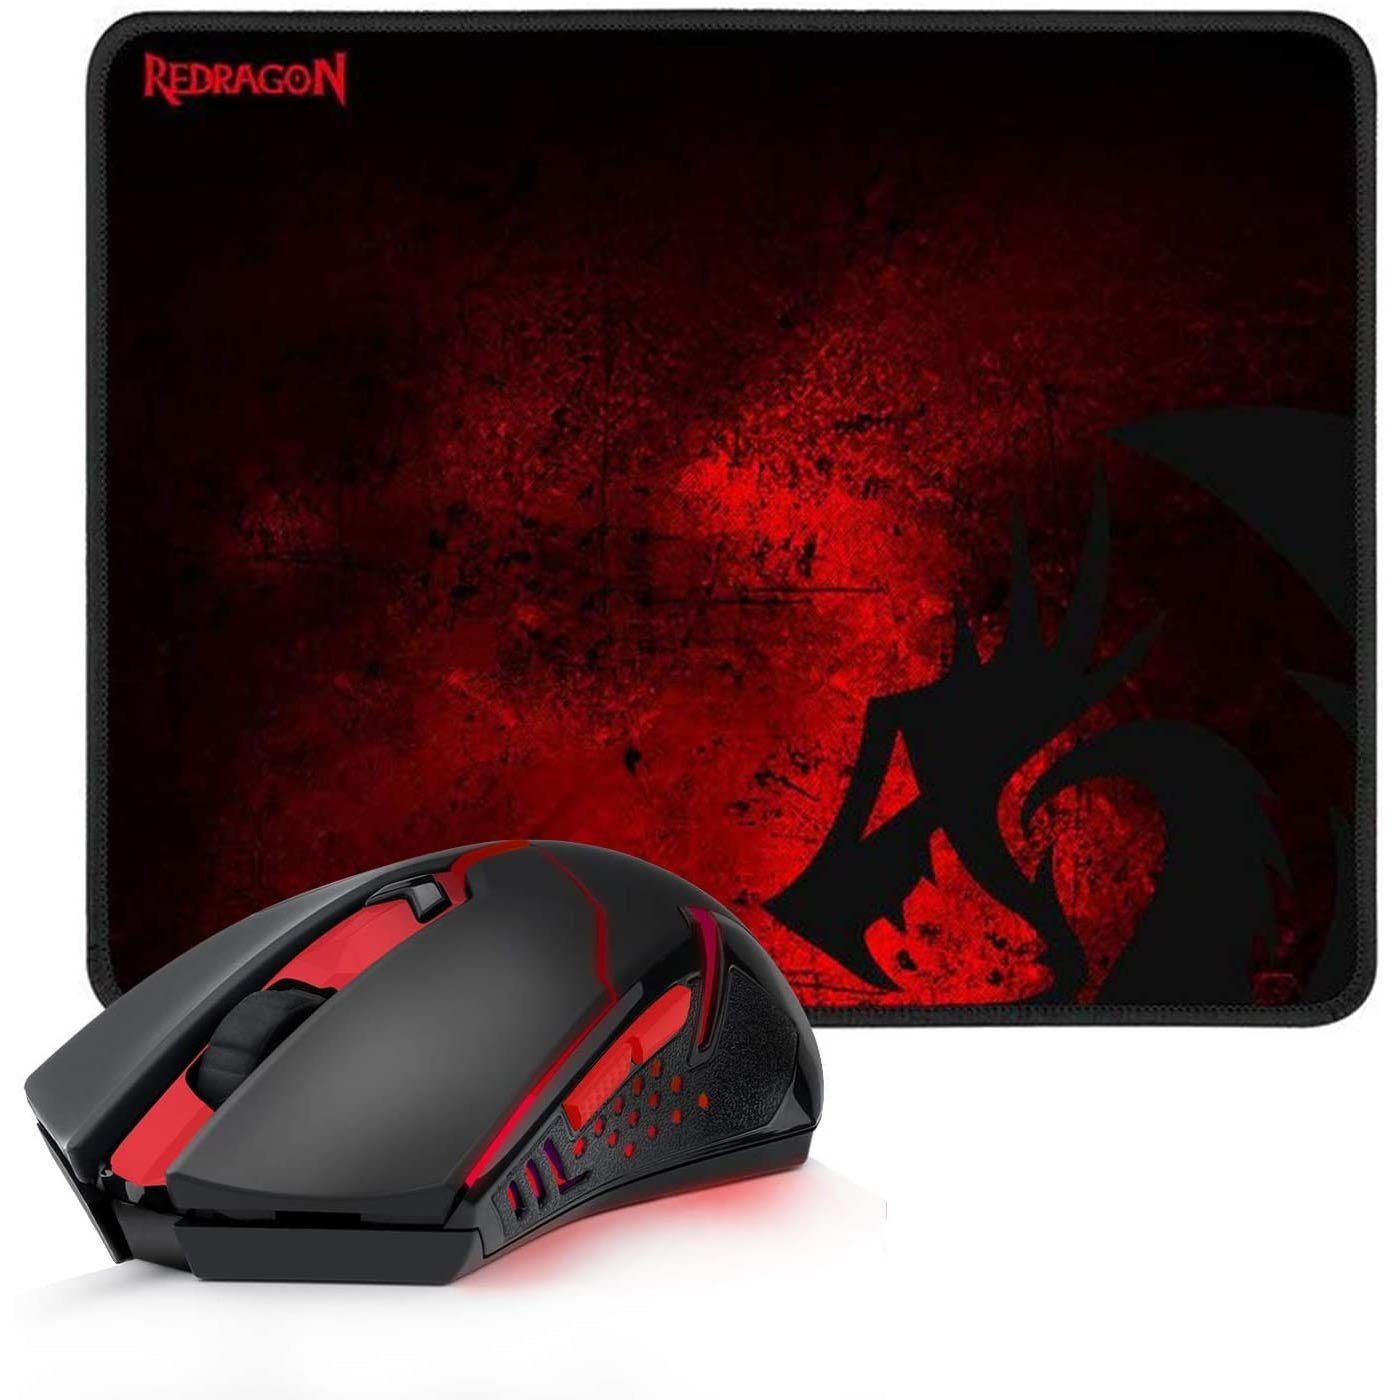 mouse usb gamer redragon m601 wl ba 2400dpi preto mouse pad 50957 2000 202866